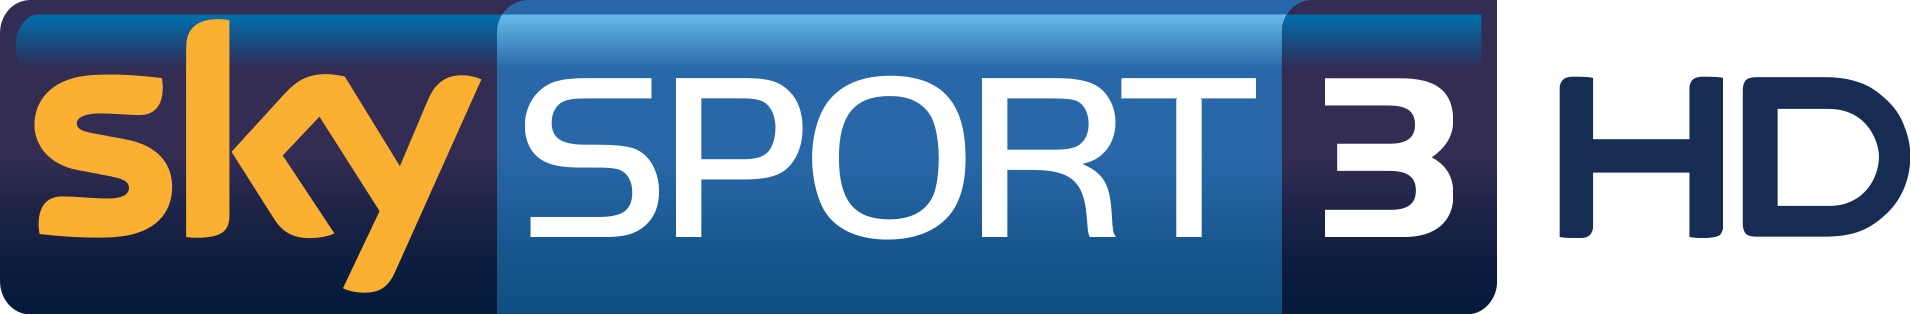 Sky Sport Hd 3 Programm